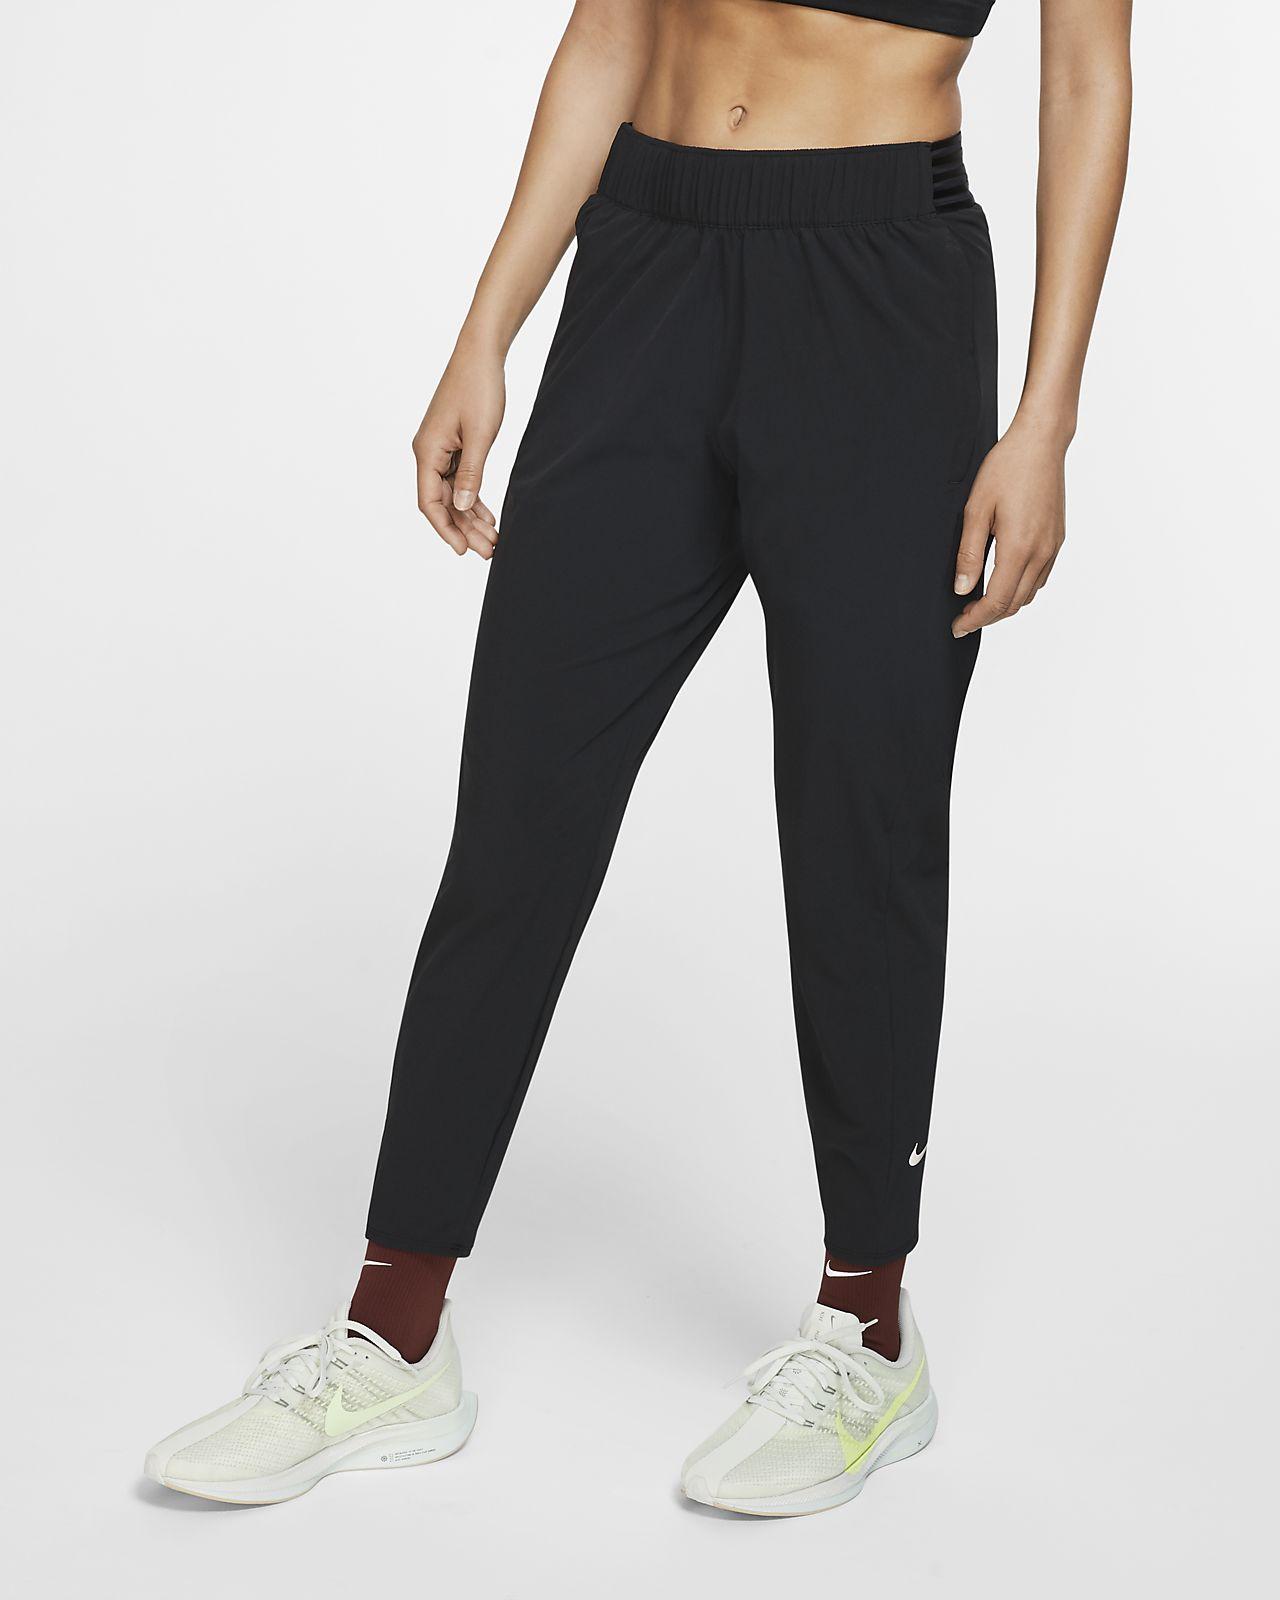 nike donna running pantaloni